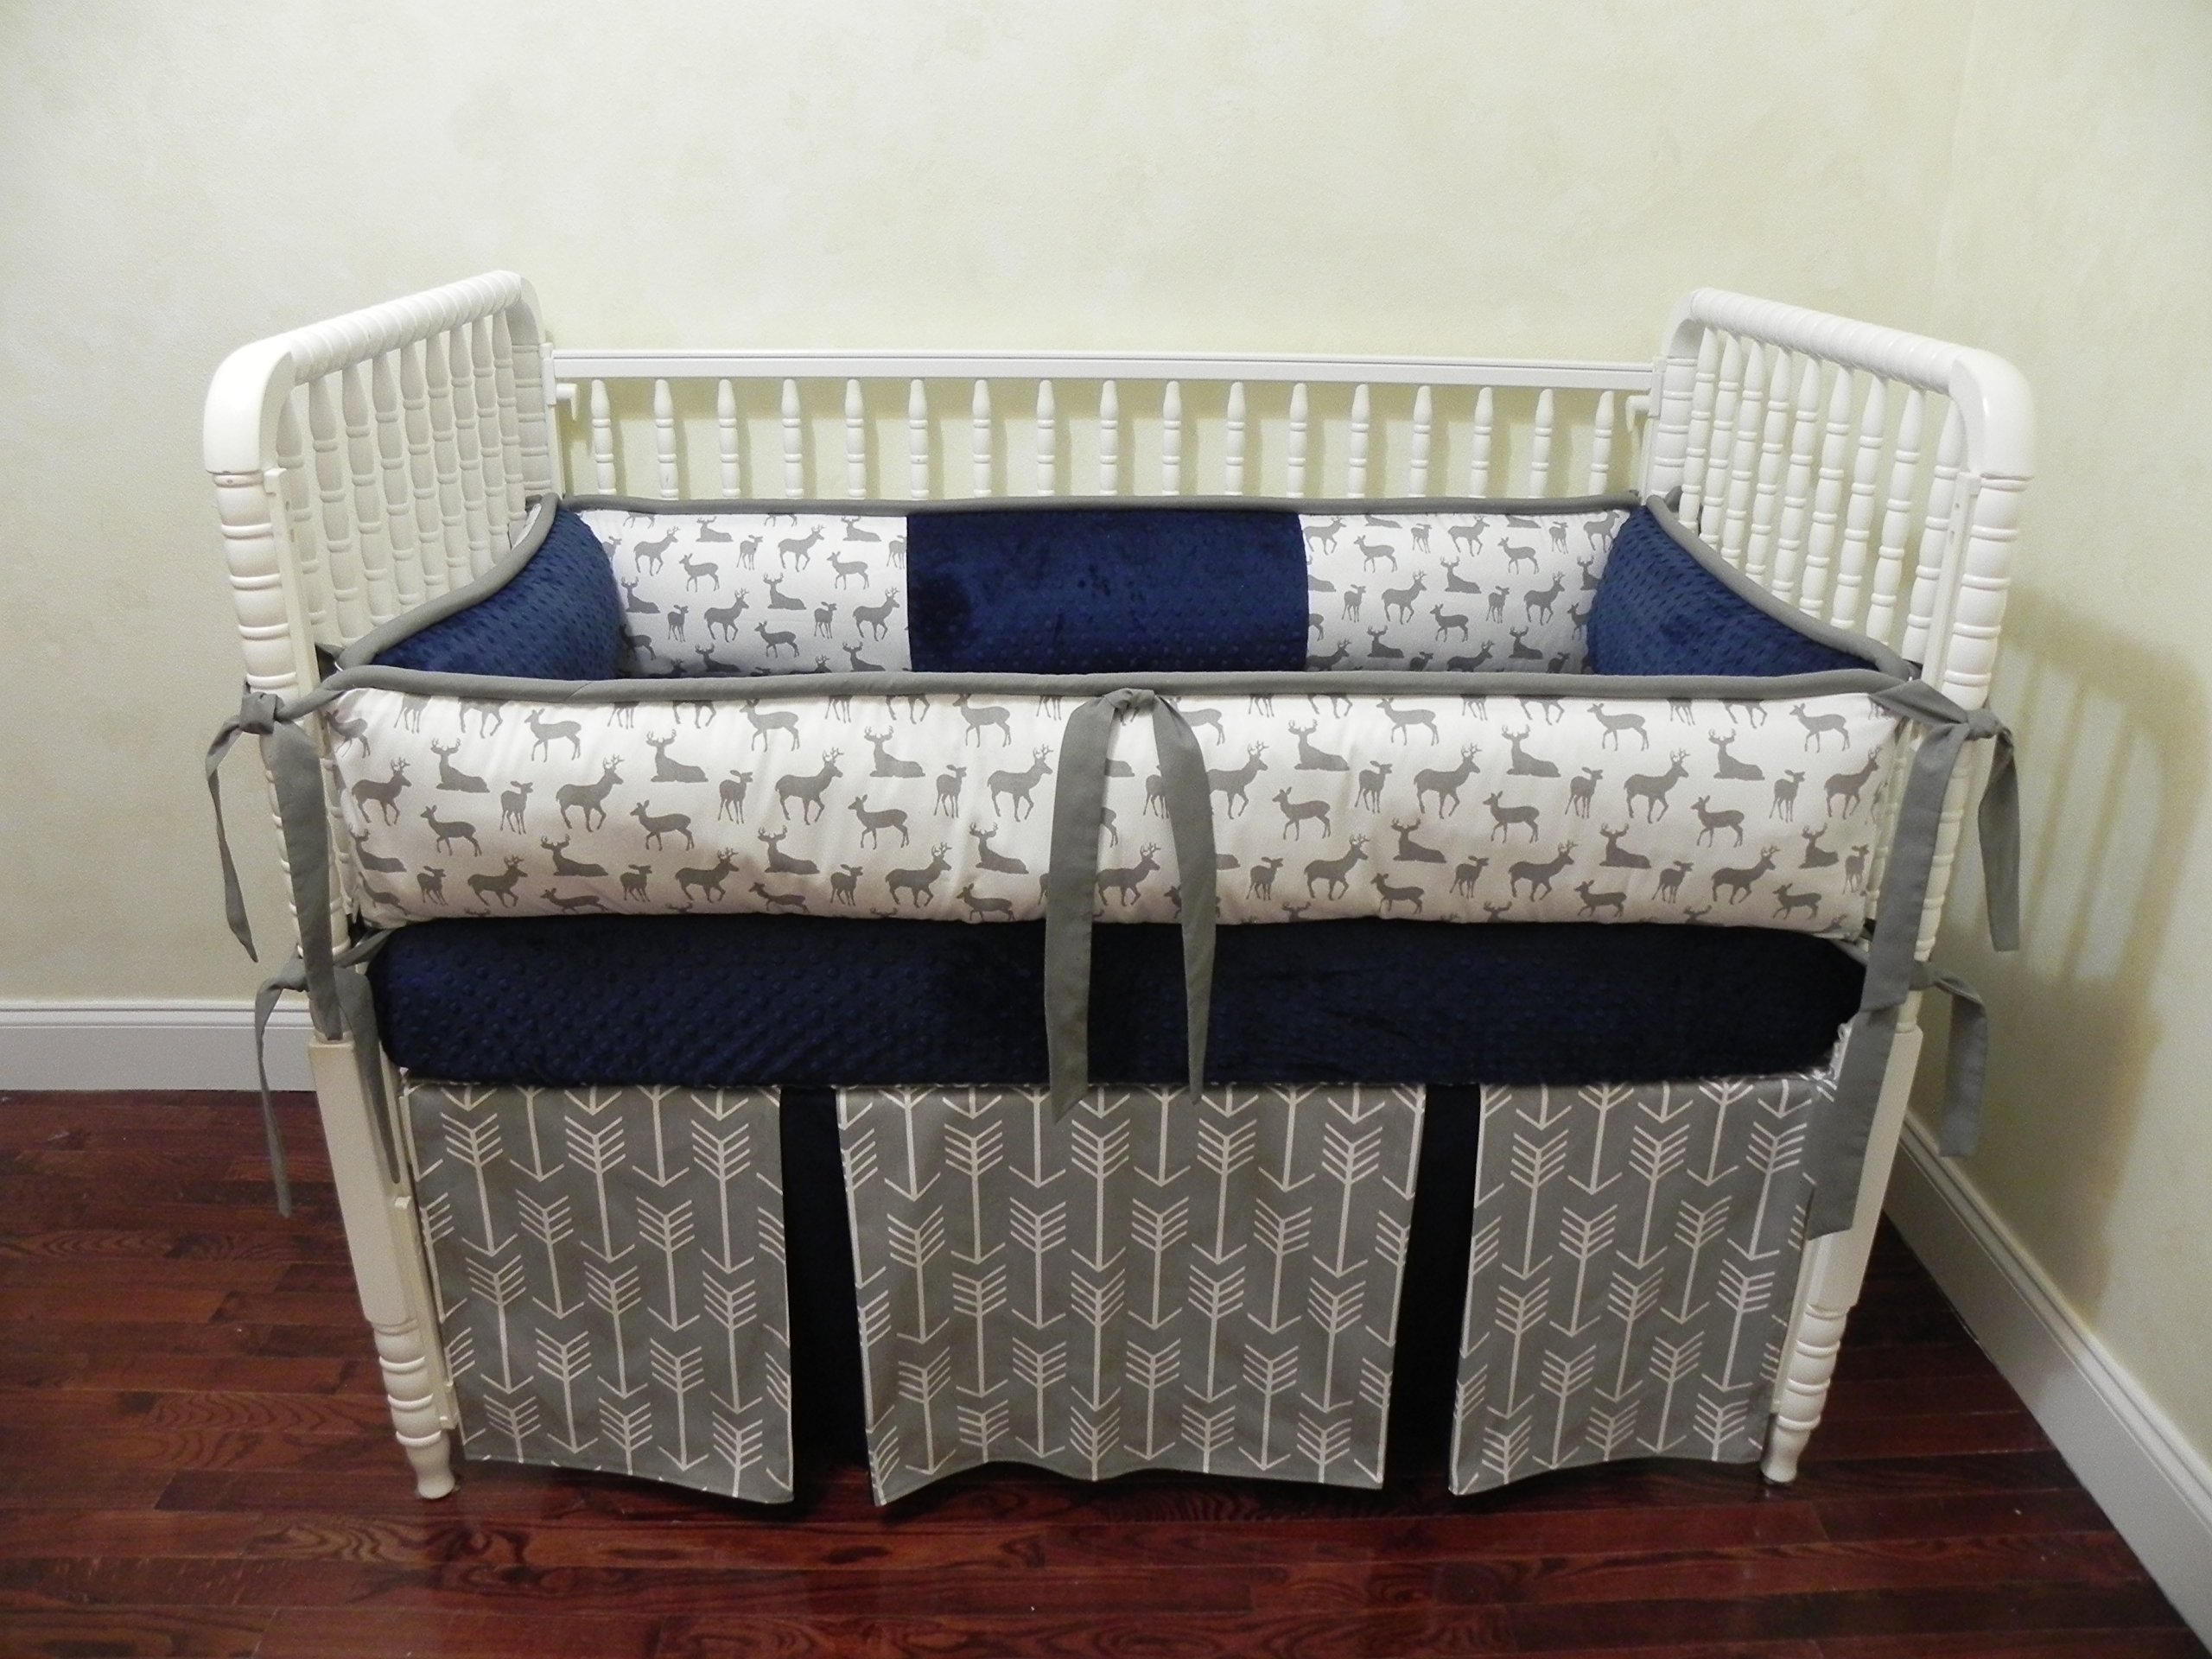 Nursery Bedding, Baby Crib Bedding Set Kees Navy, Gray and Navy Baby Bedding, Deer Crib Bedding, Gray Arrows Baby Bedding - Choose Your Pieces